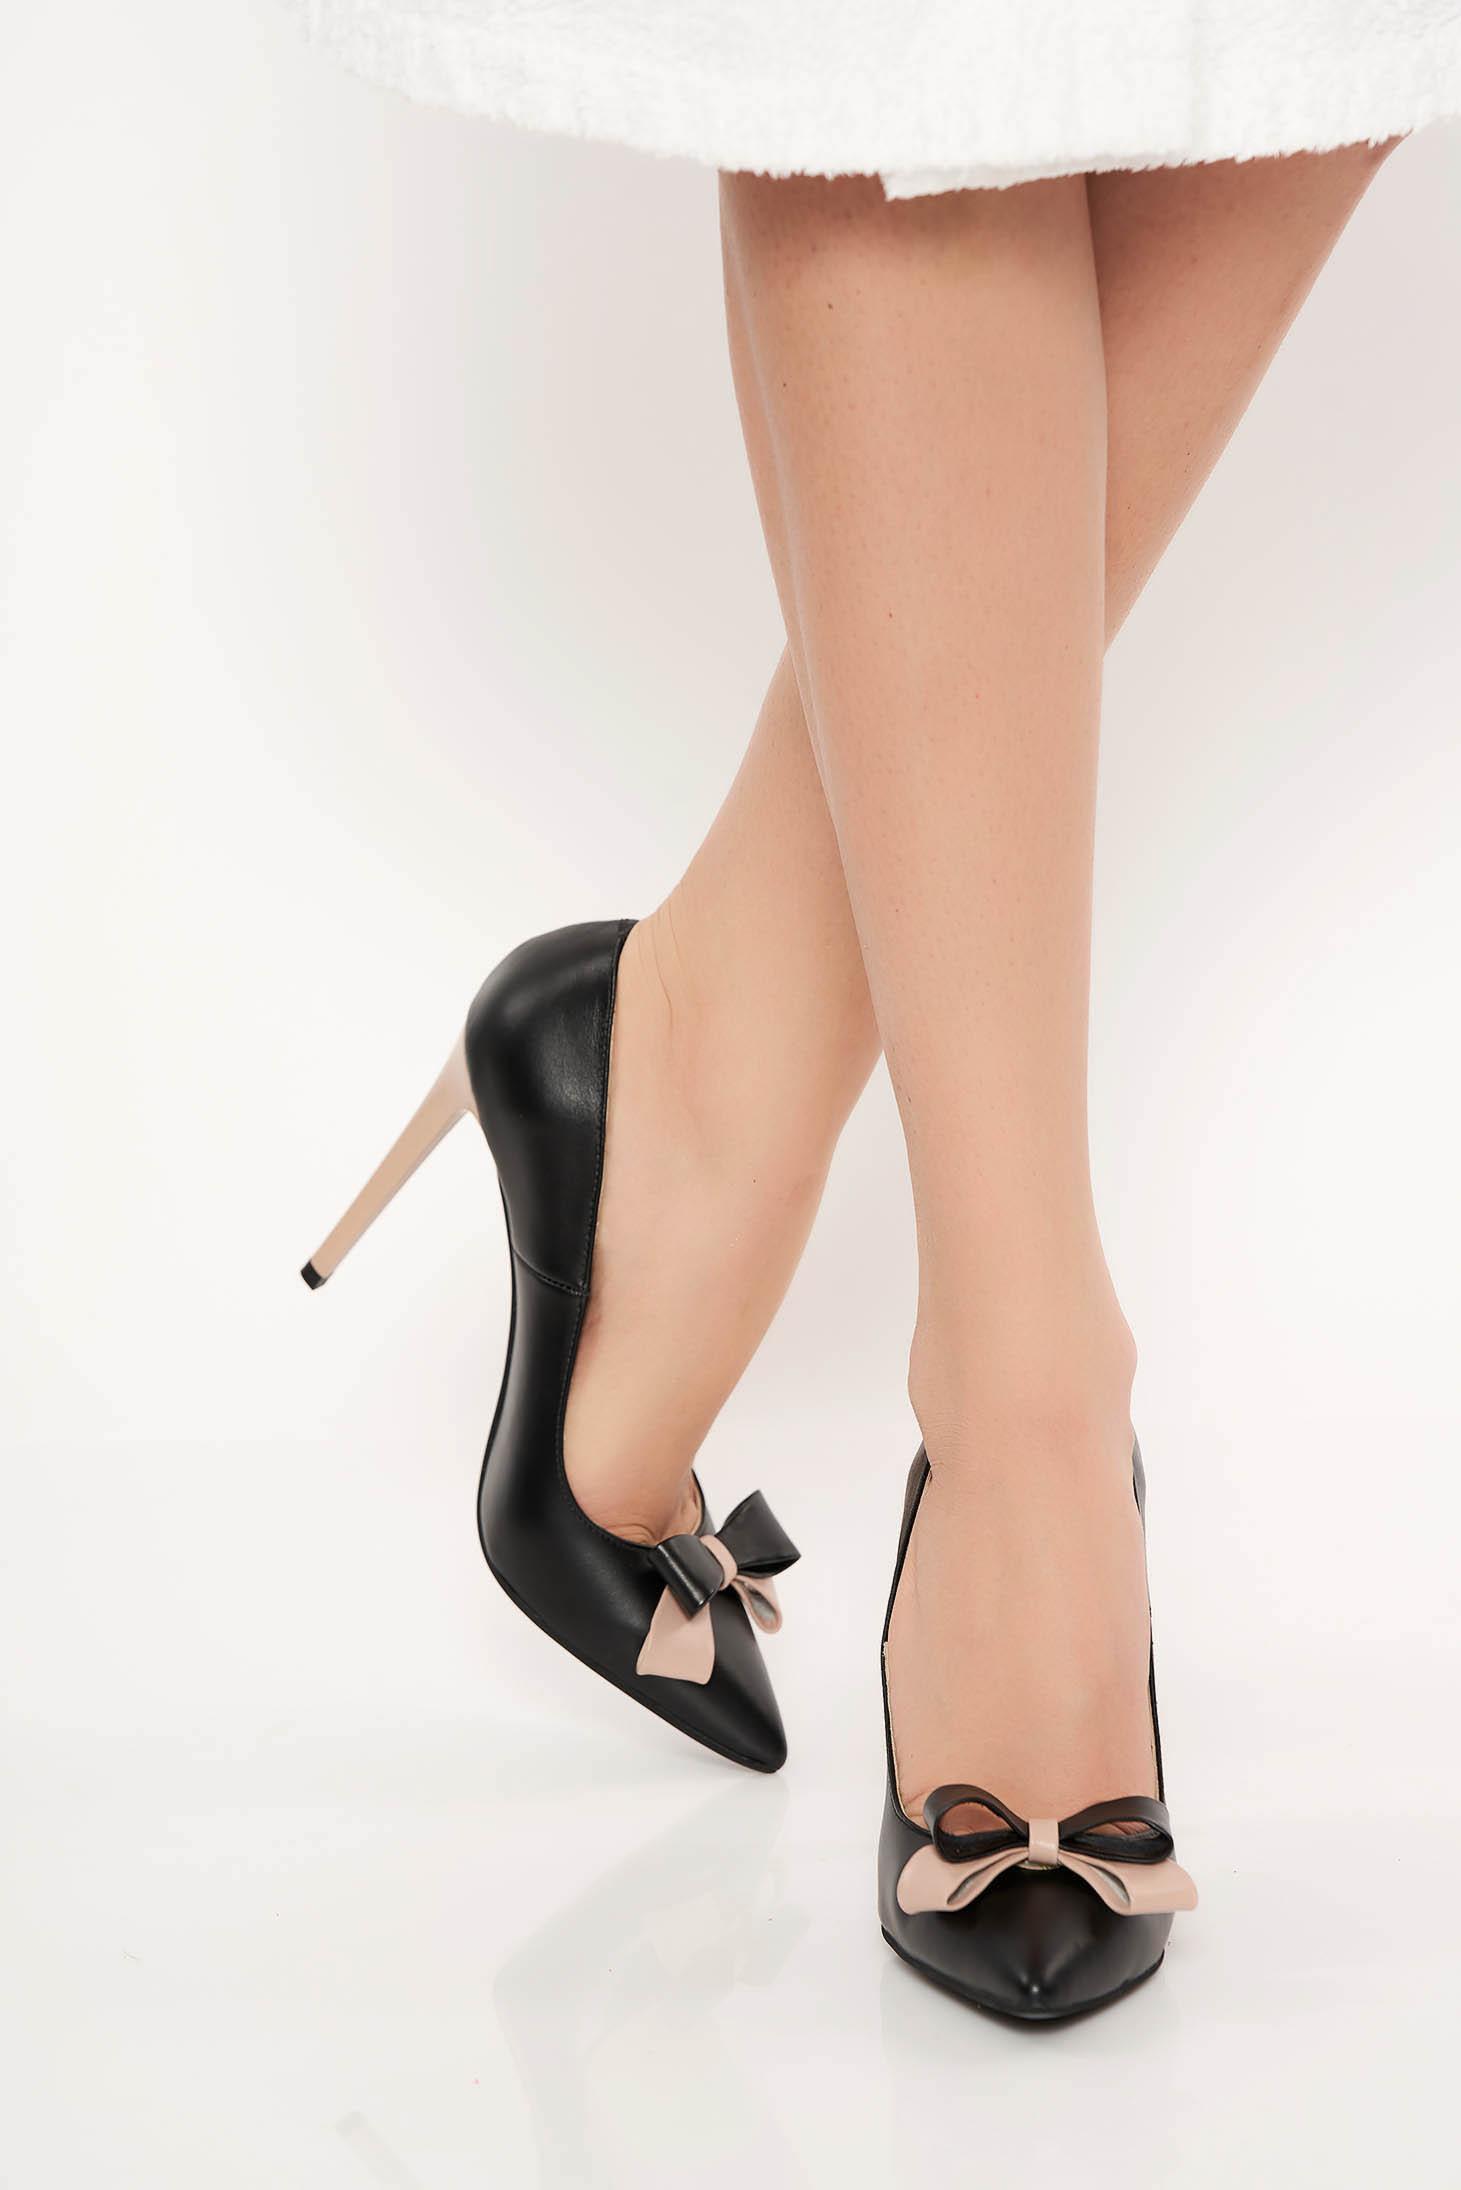 Pantofi negri office din piele naturala cu varful usor ascutit accesorizat cu o fundita